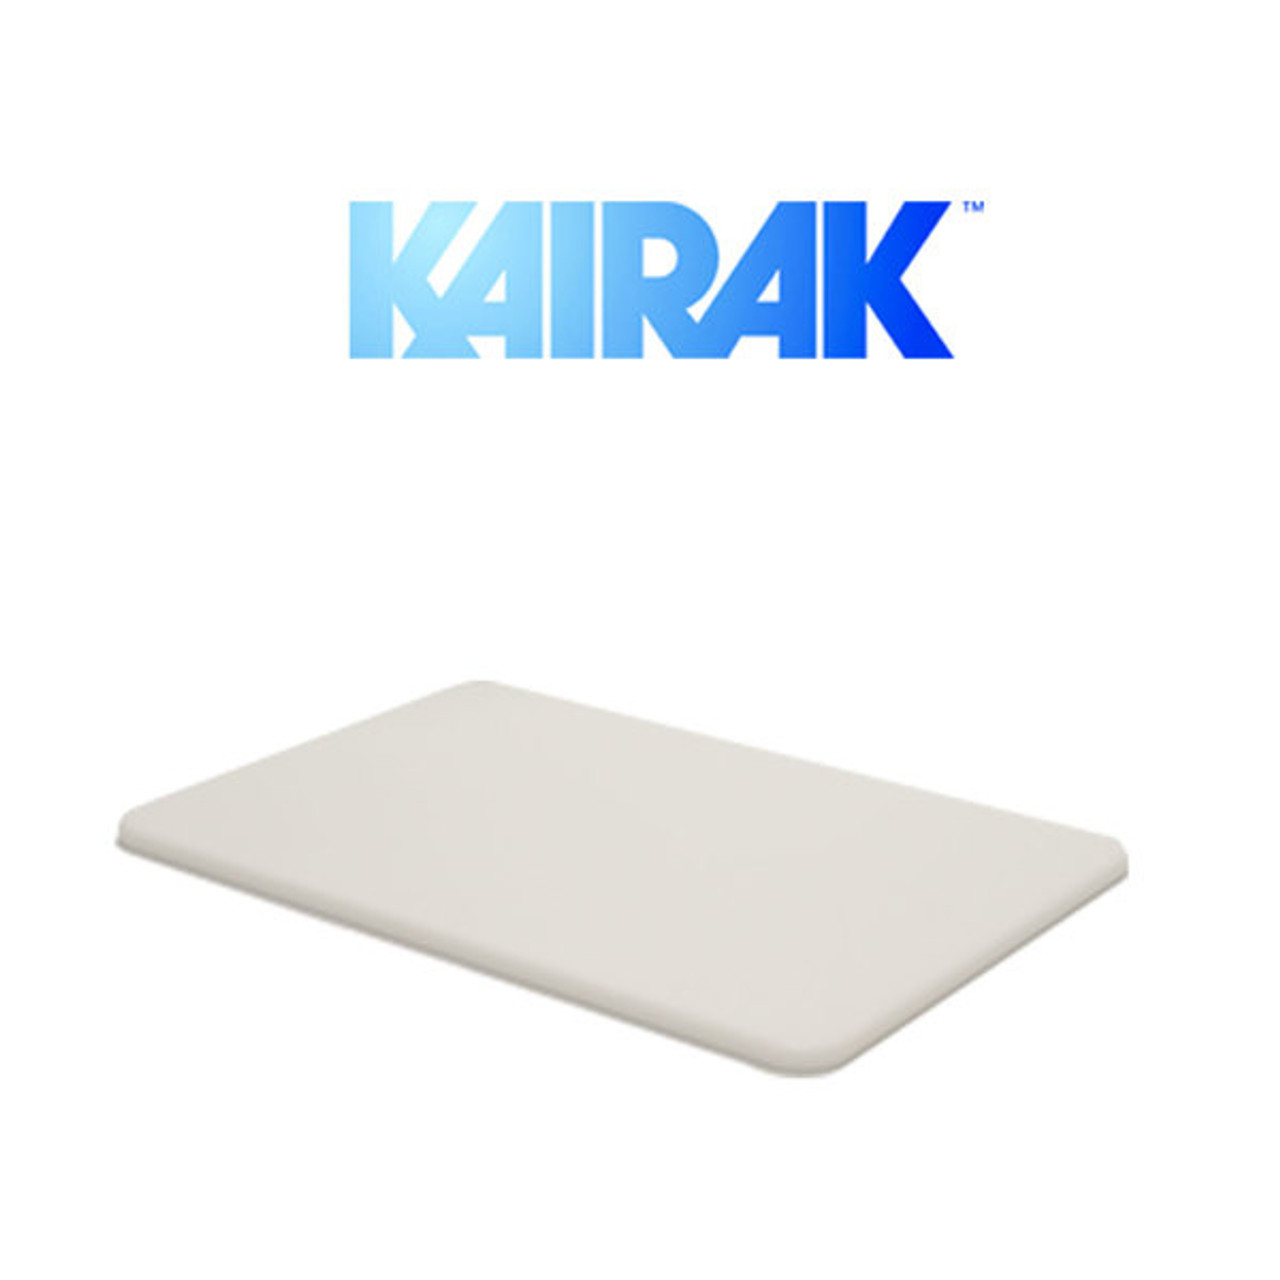 OEM Cutting Board - Kairak - P#: 12177